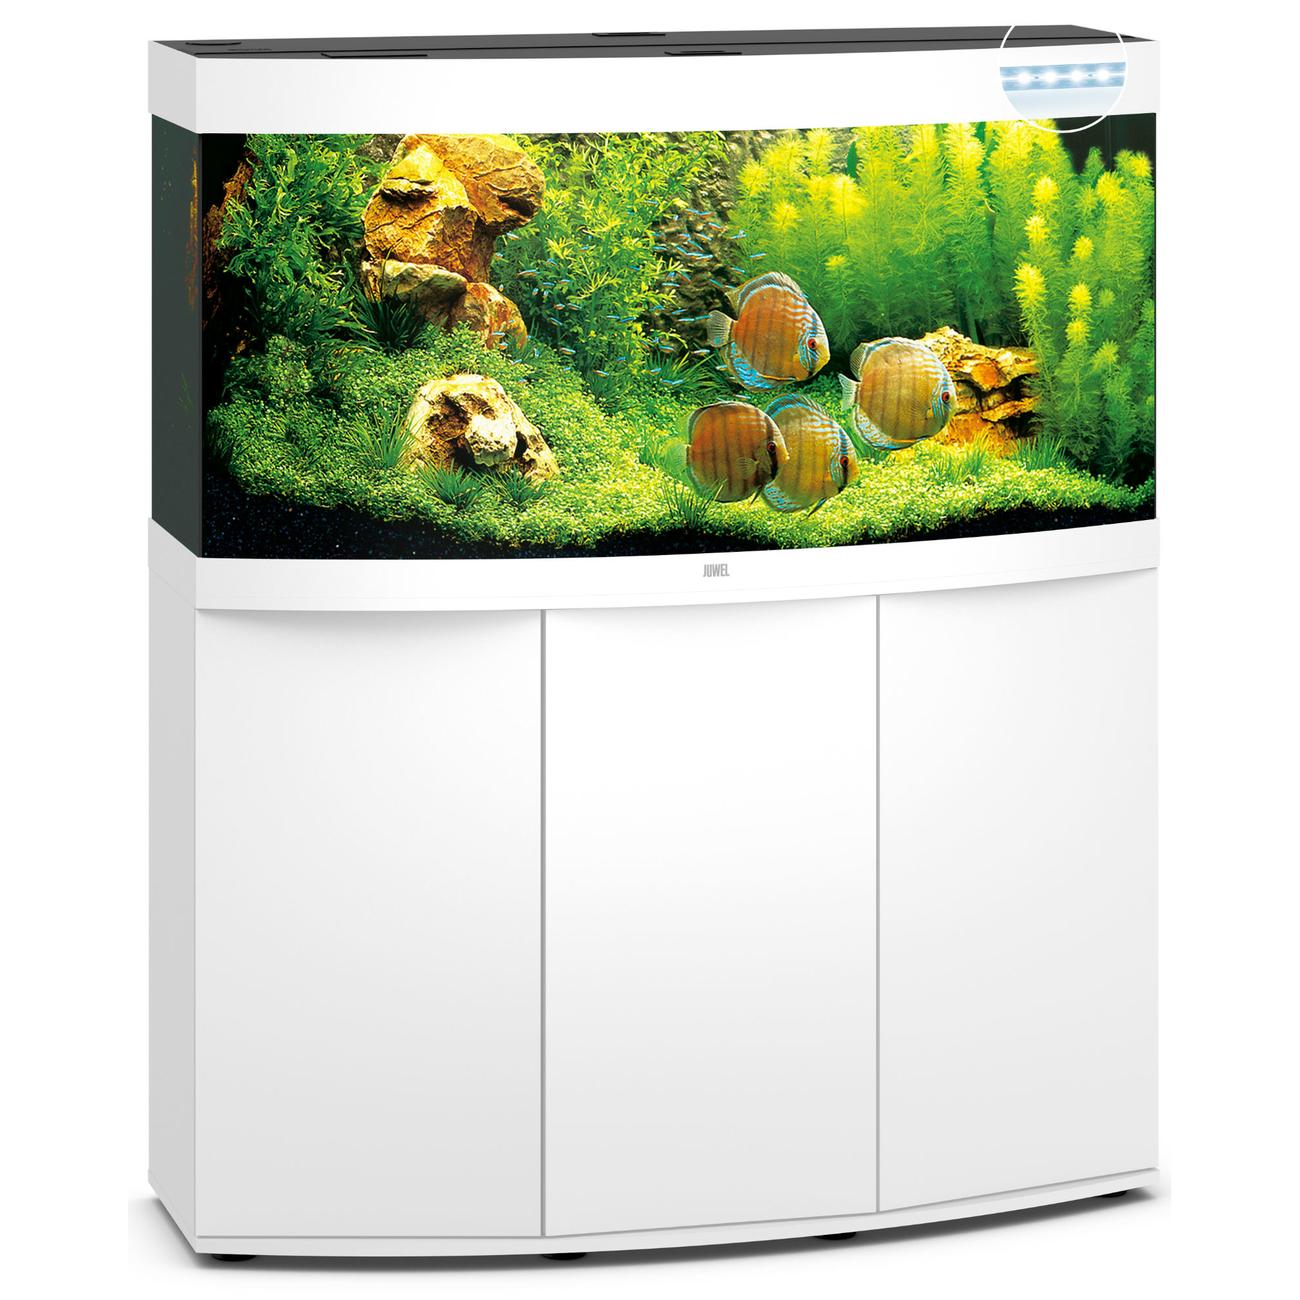 Juwel Vision 260 LED Aquarium mit Unterschrank SBX, Bild 8